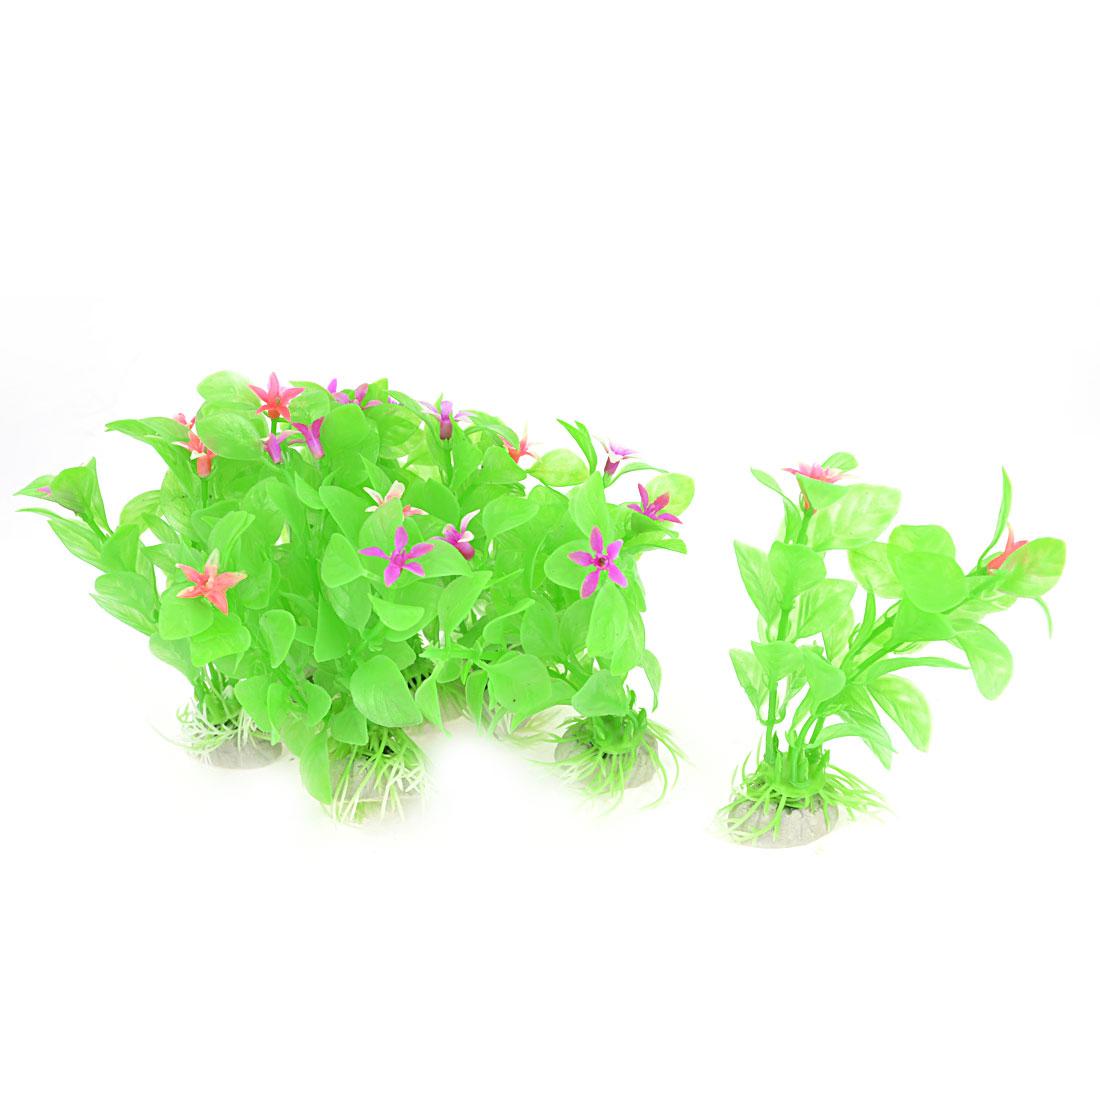 Aquarium Tanks Decor Green Plastic Emulational Aquaric Plant Grass 10cm 10 Pcs